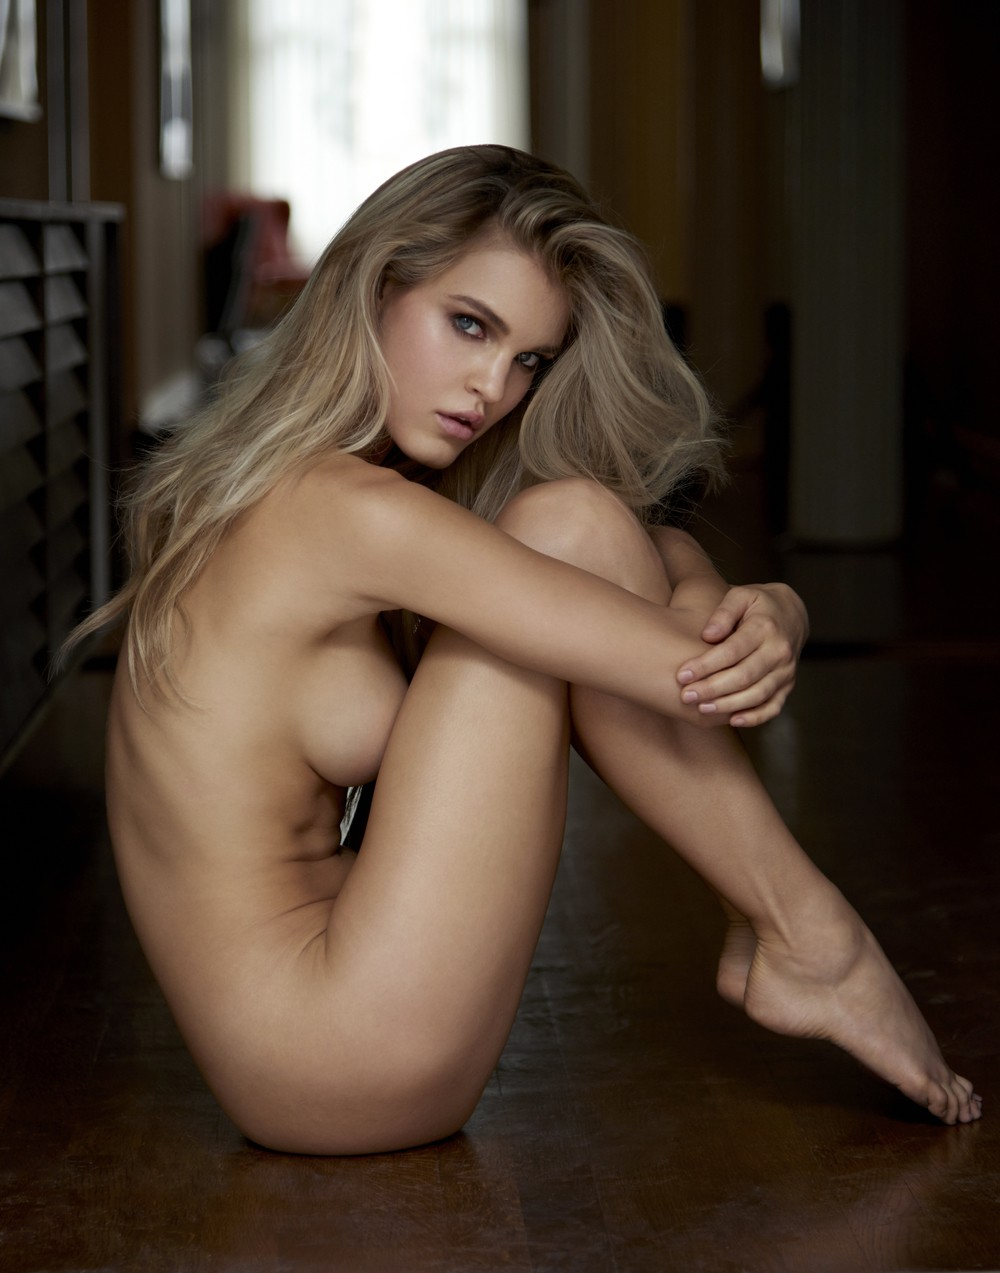 belle blonde de profil